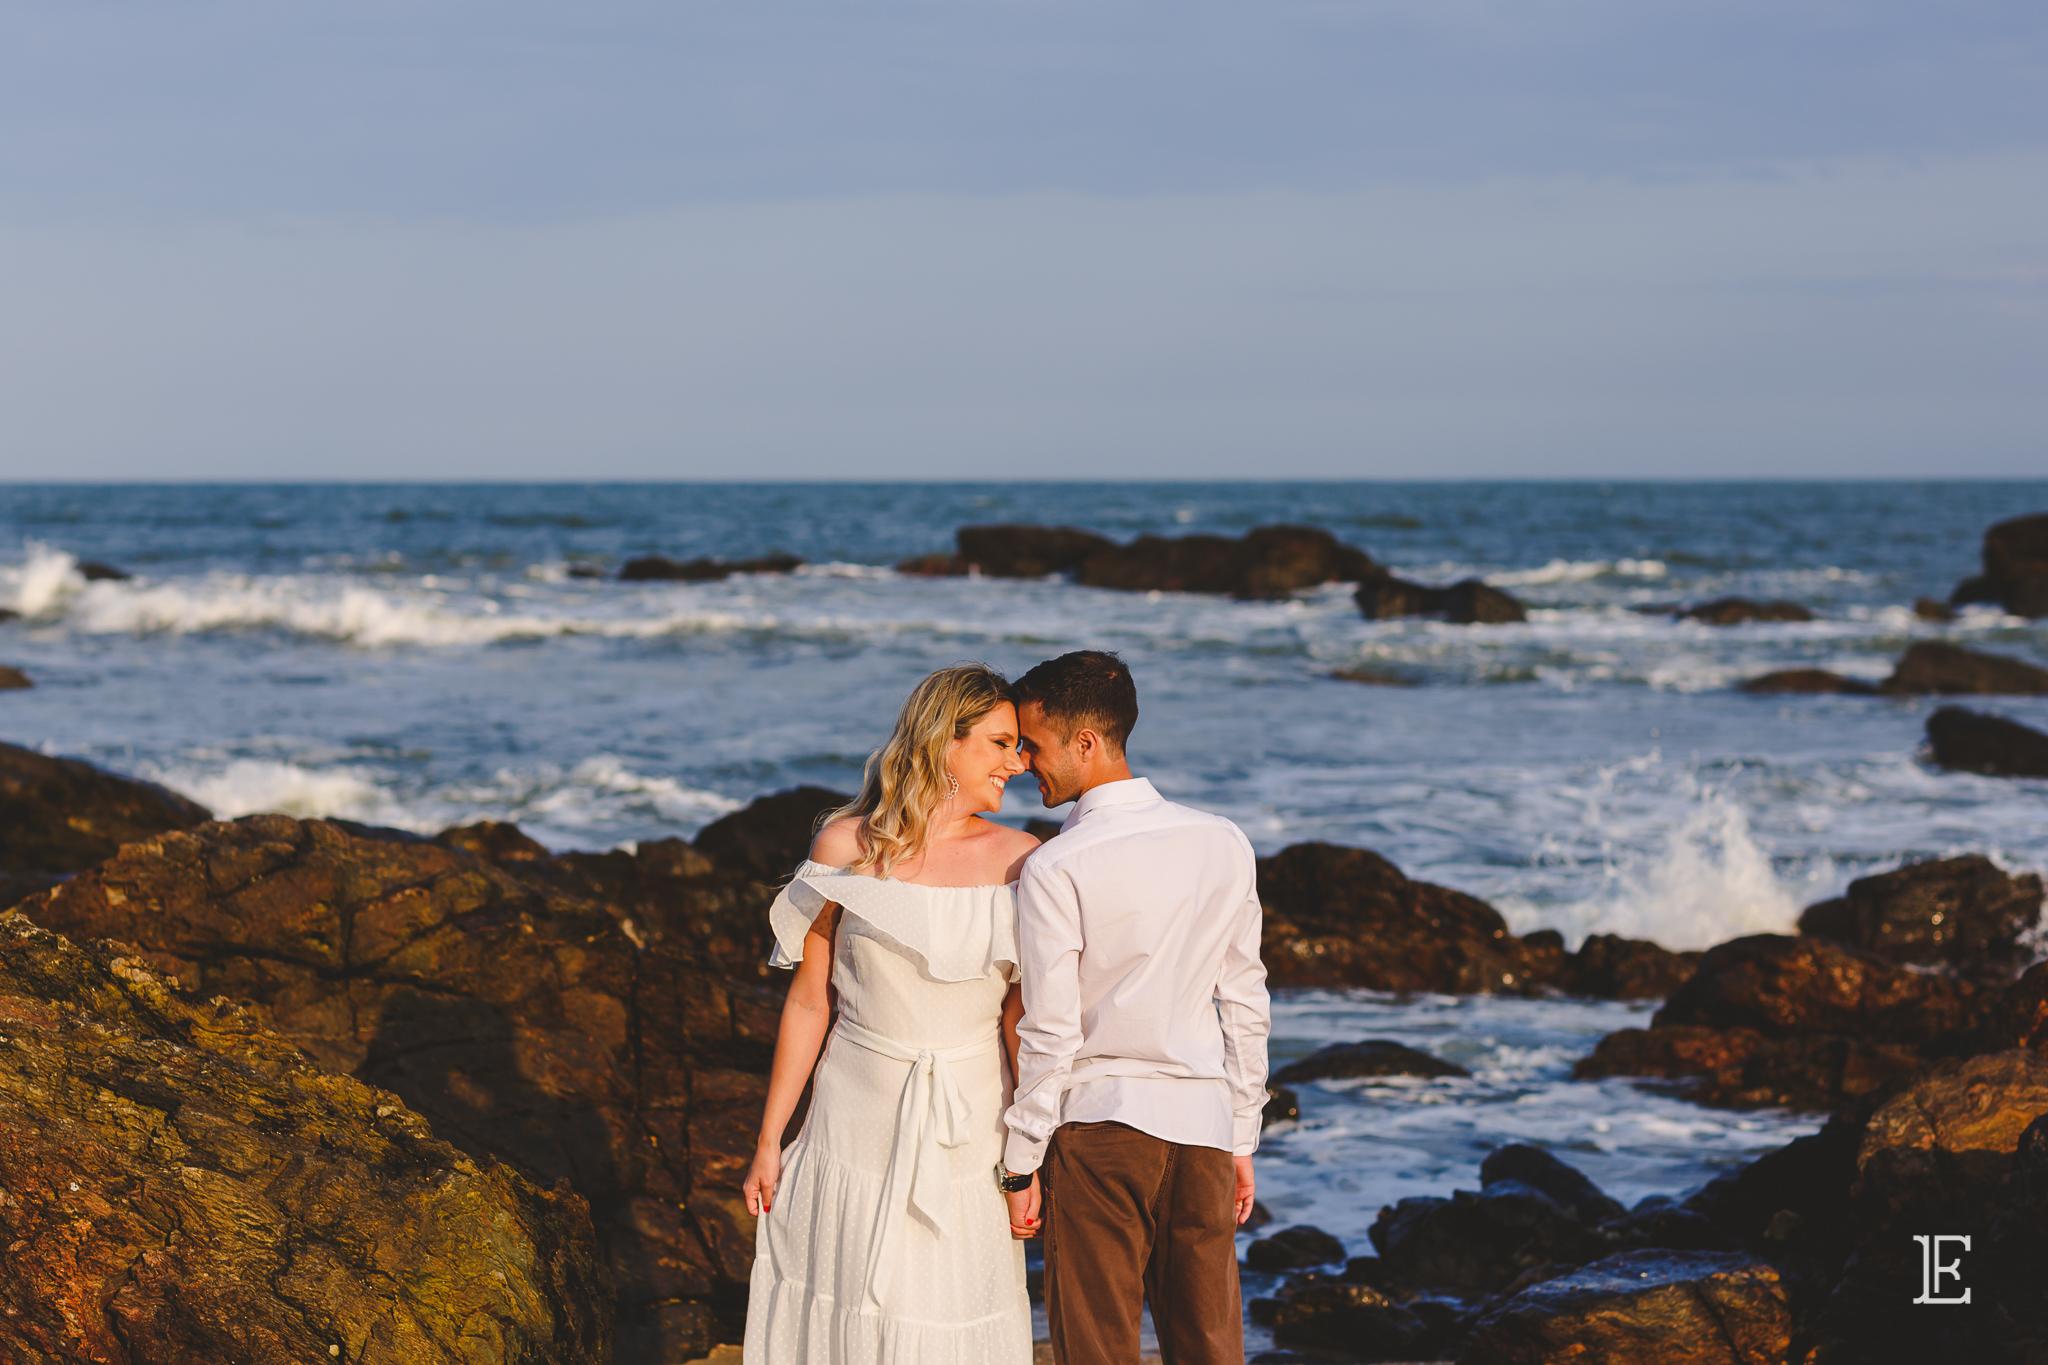 Pré-Wedding-Balneario-Camboriú-Santa-Catarina-Praia-Noivos-Gabriela-e-Fernando-Fotografo-Fernando-Longen